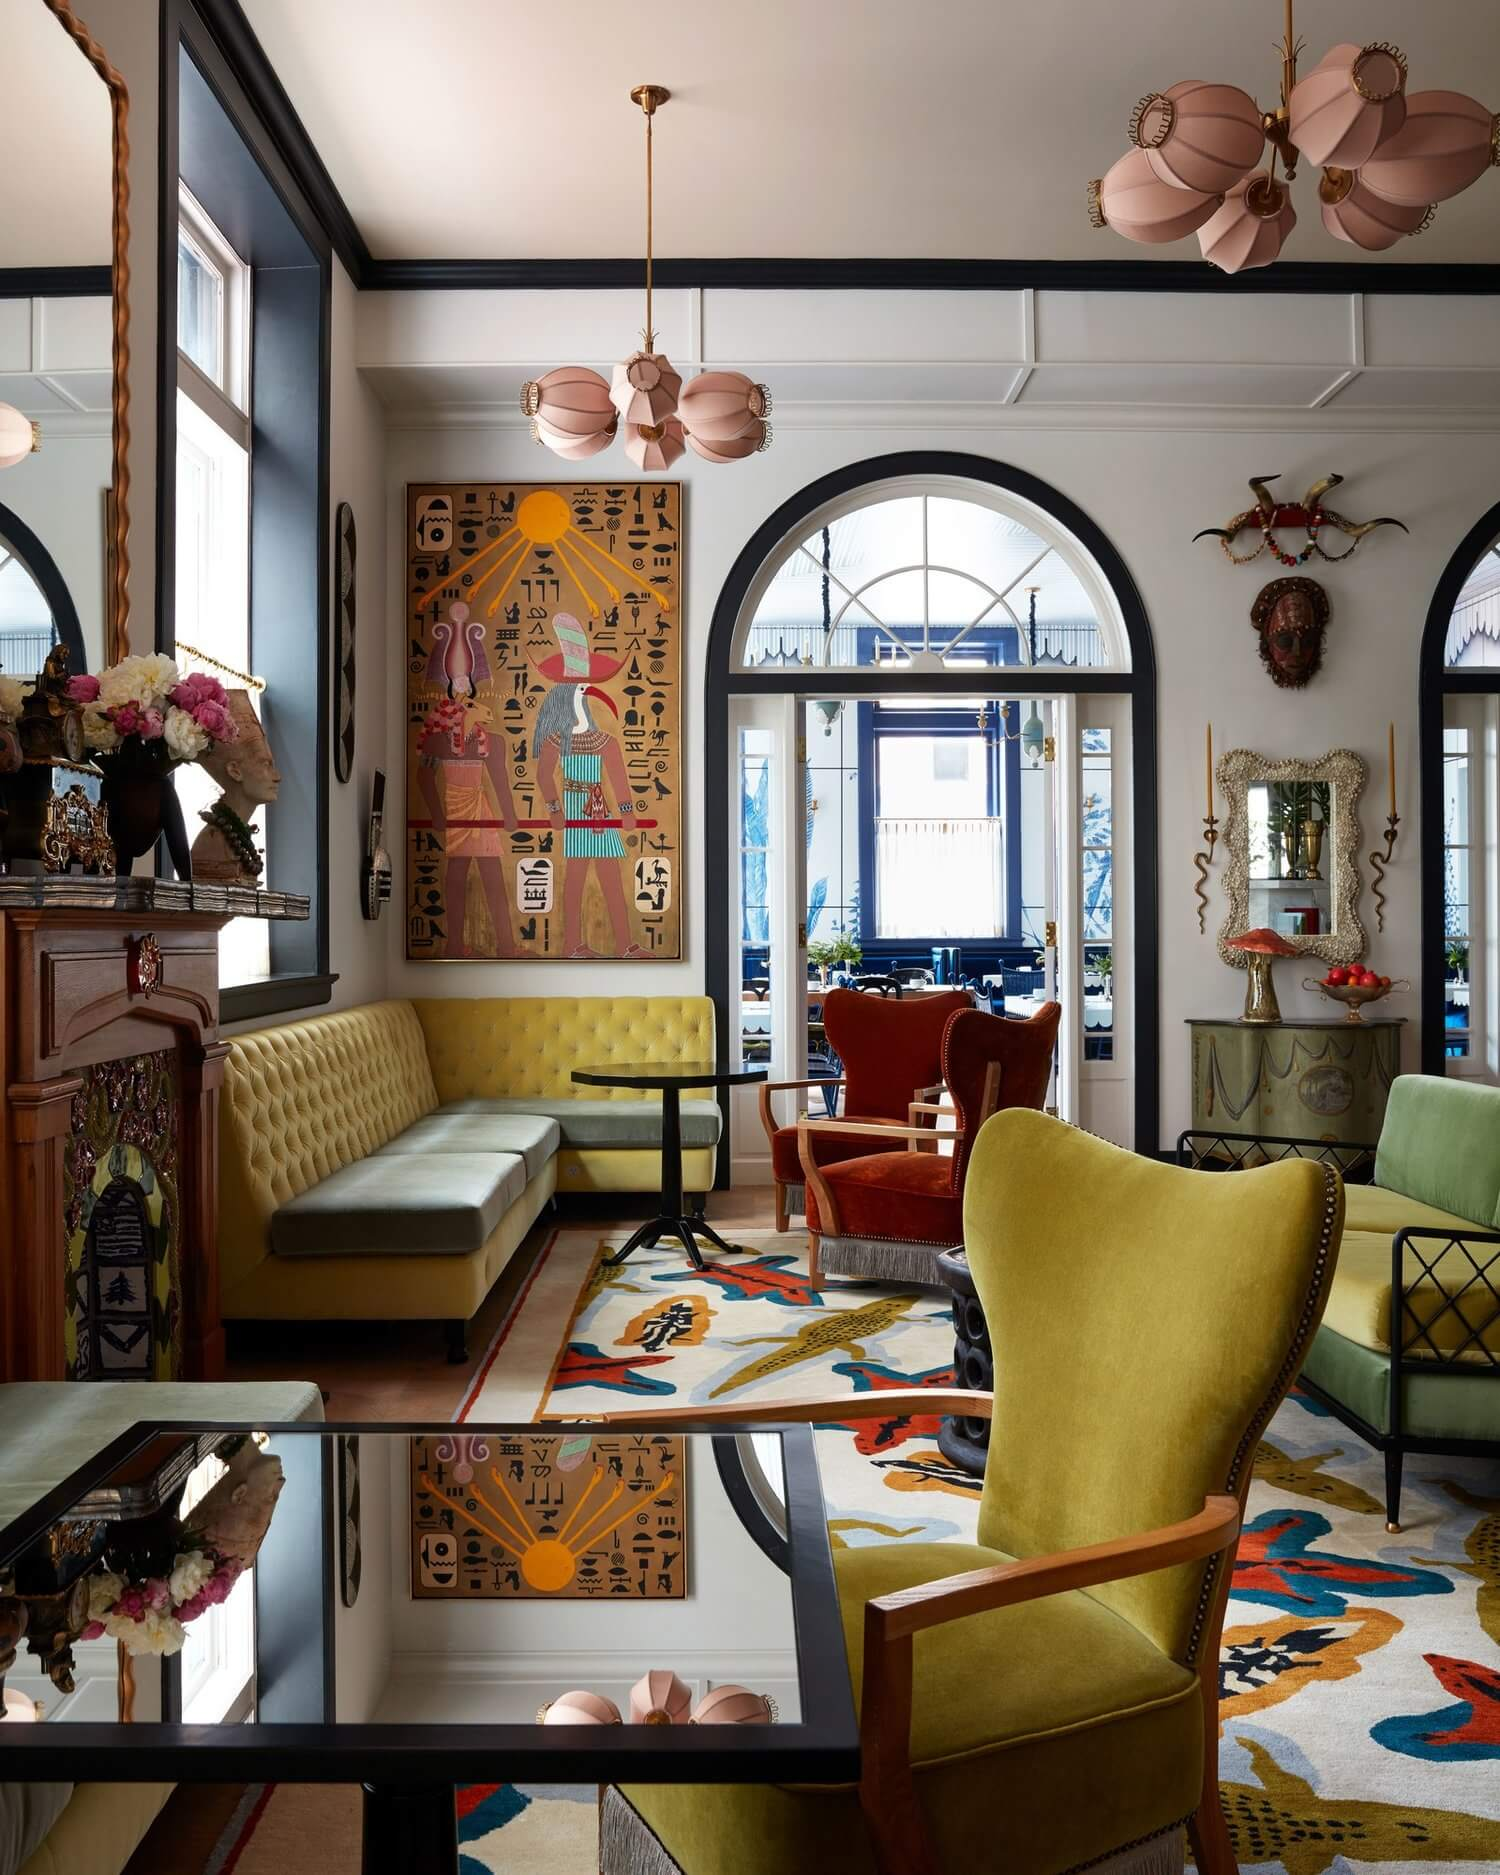 Maison de la Luz Luxury Hotel in New Orleans